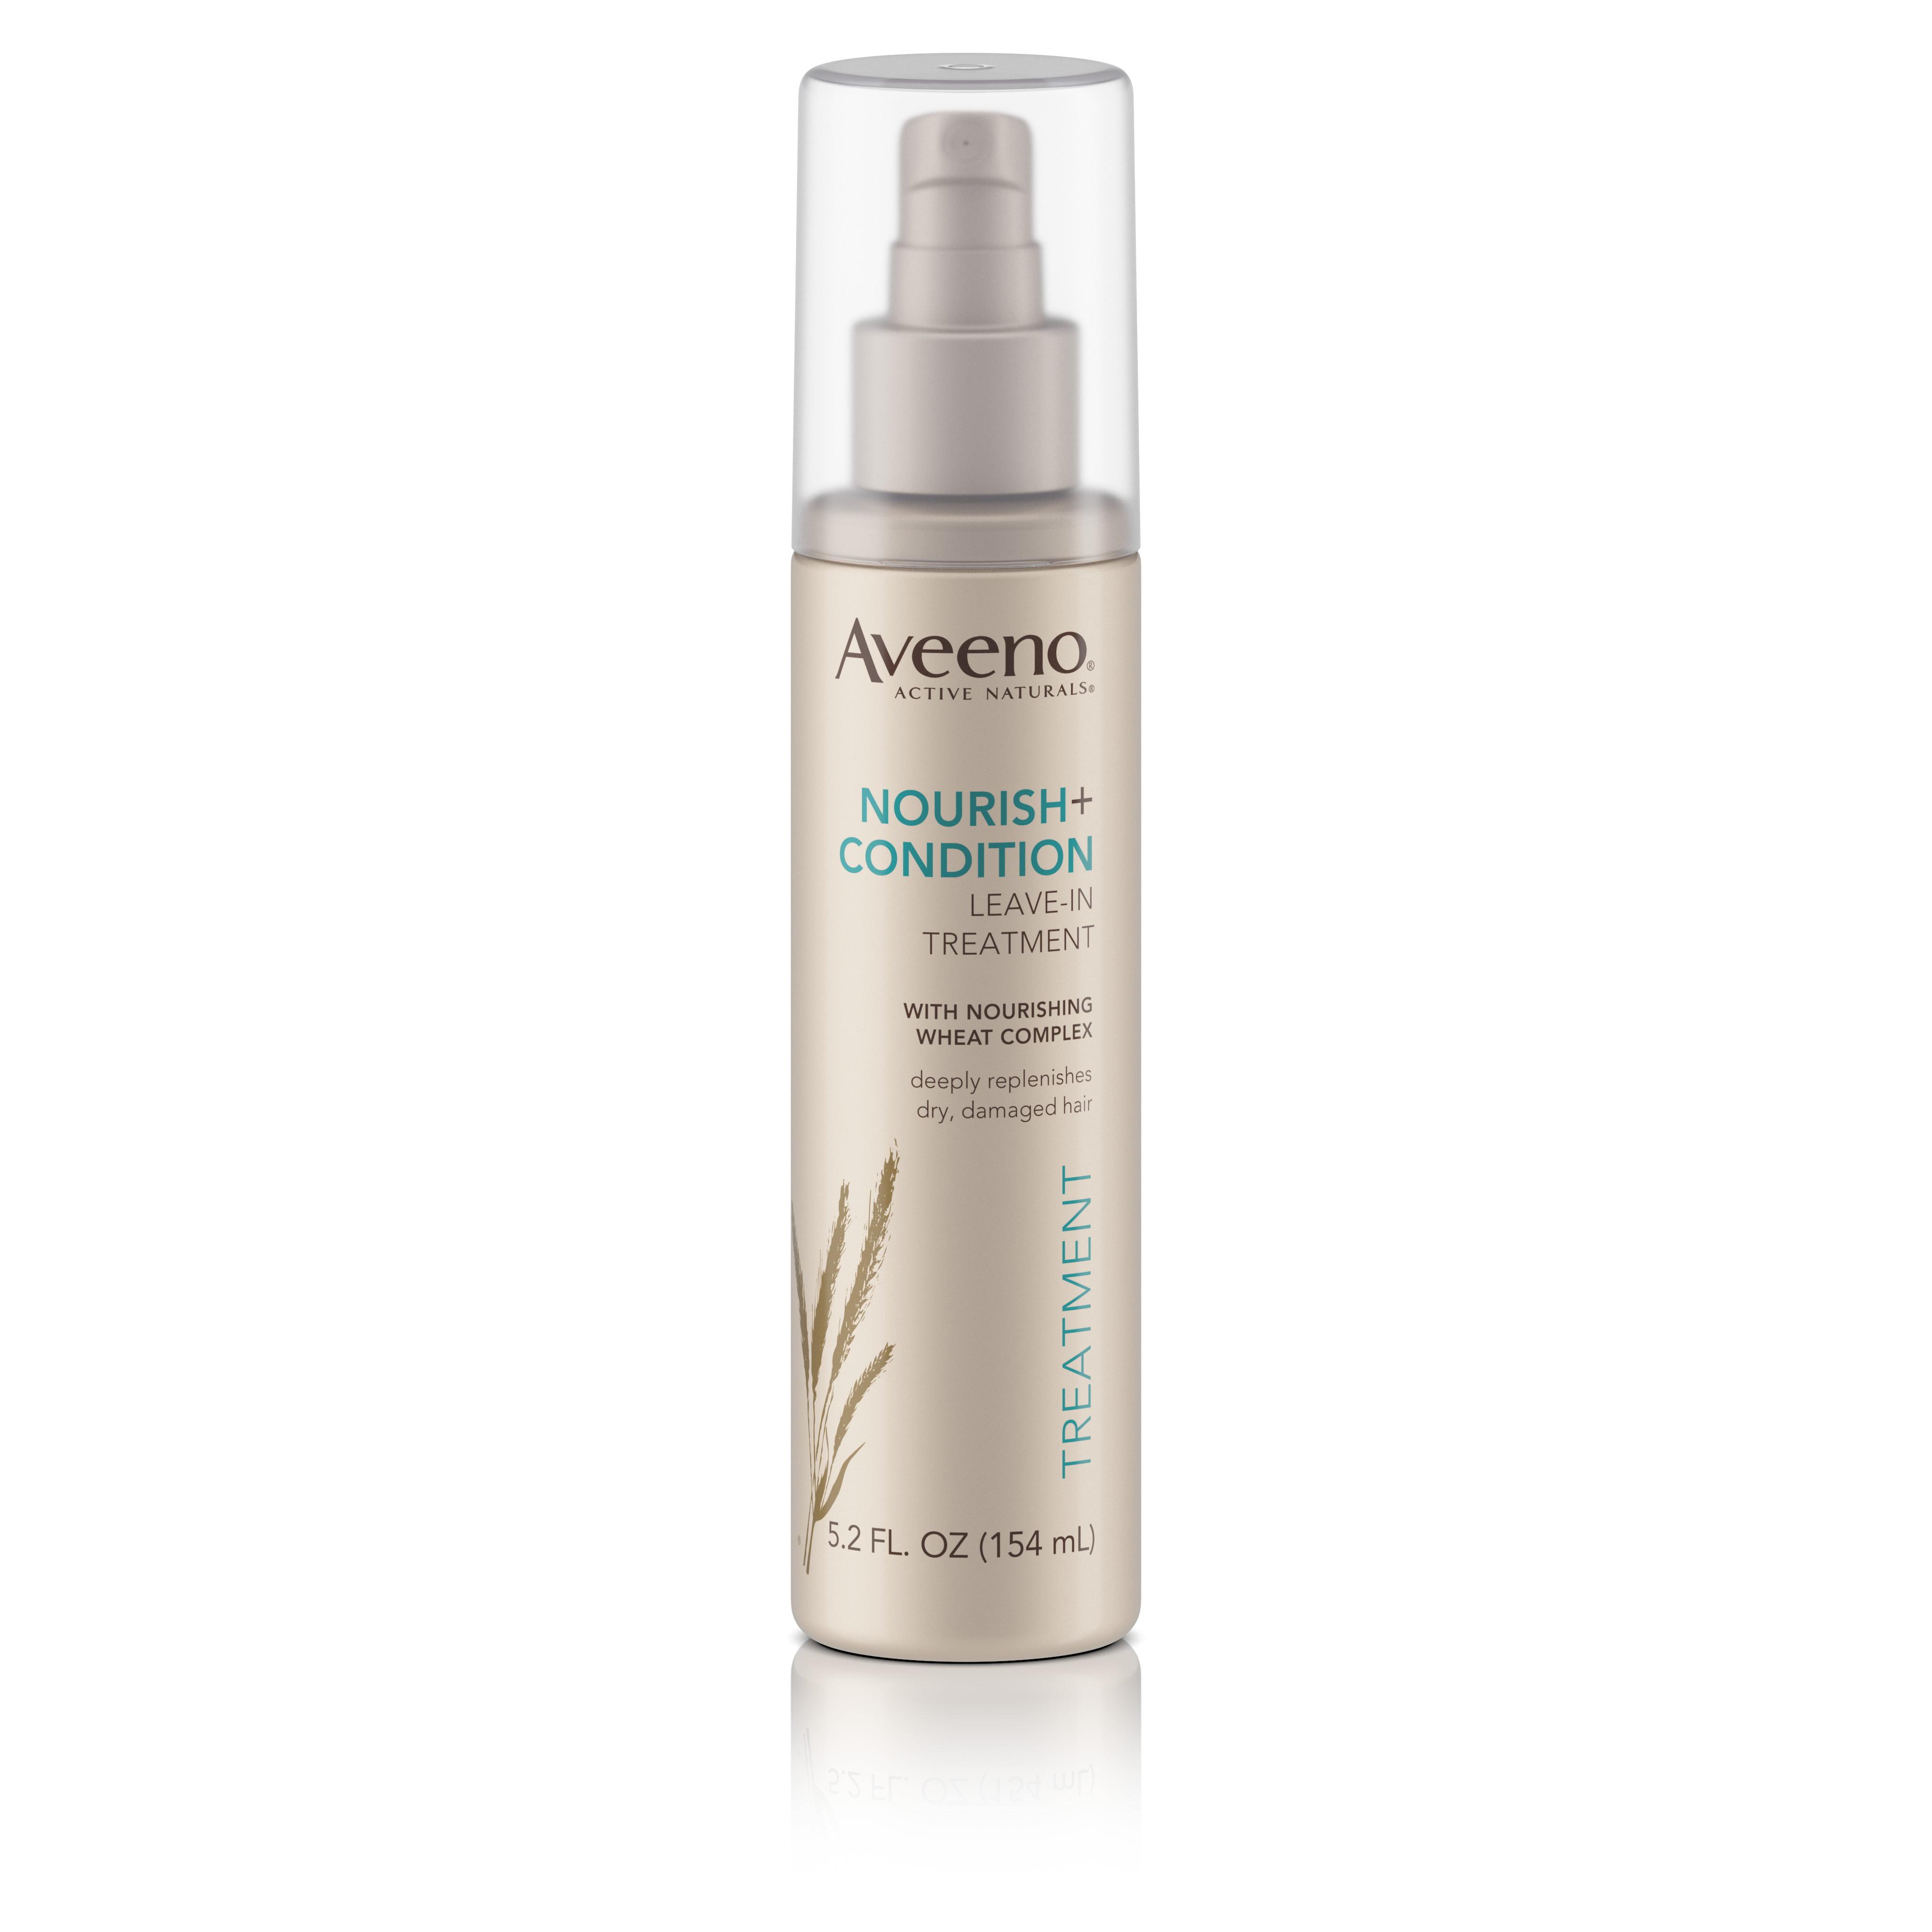 Aveeno Nourish+ Condition Leave-In Treatment, Replenish Damaged Hair, 5.2 Fl. Oz - Walmart.com